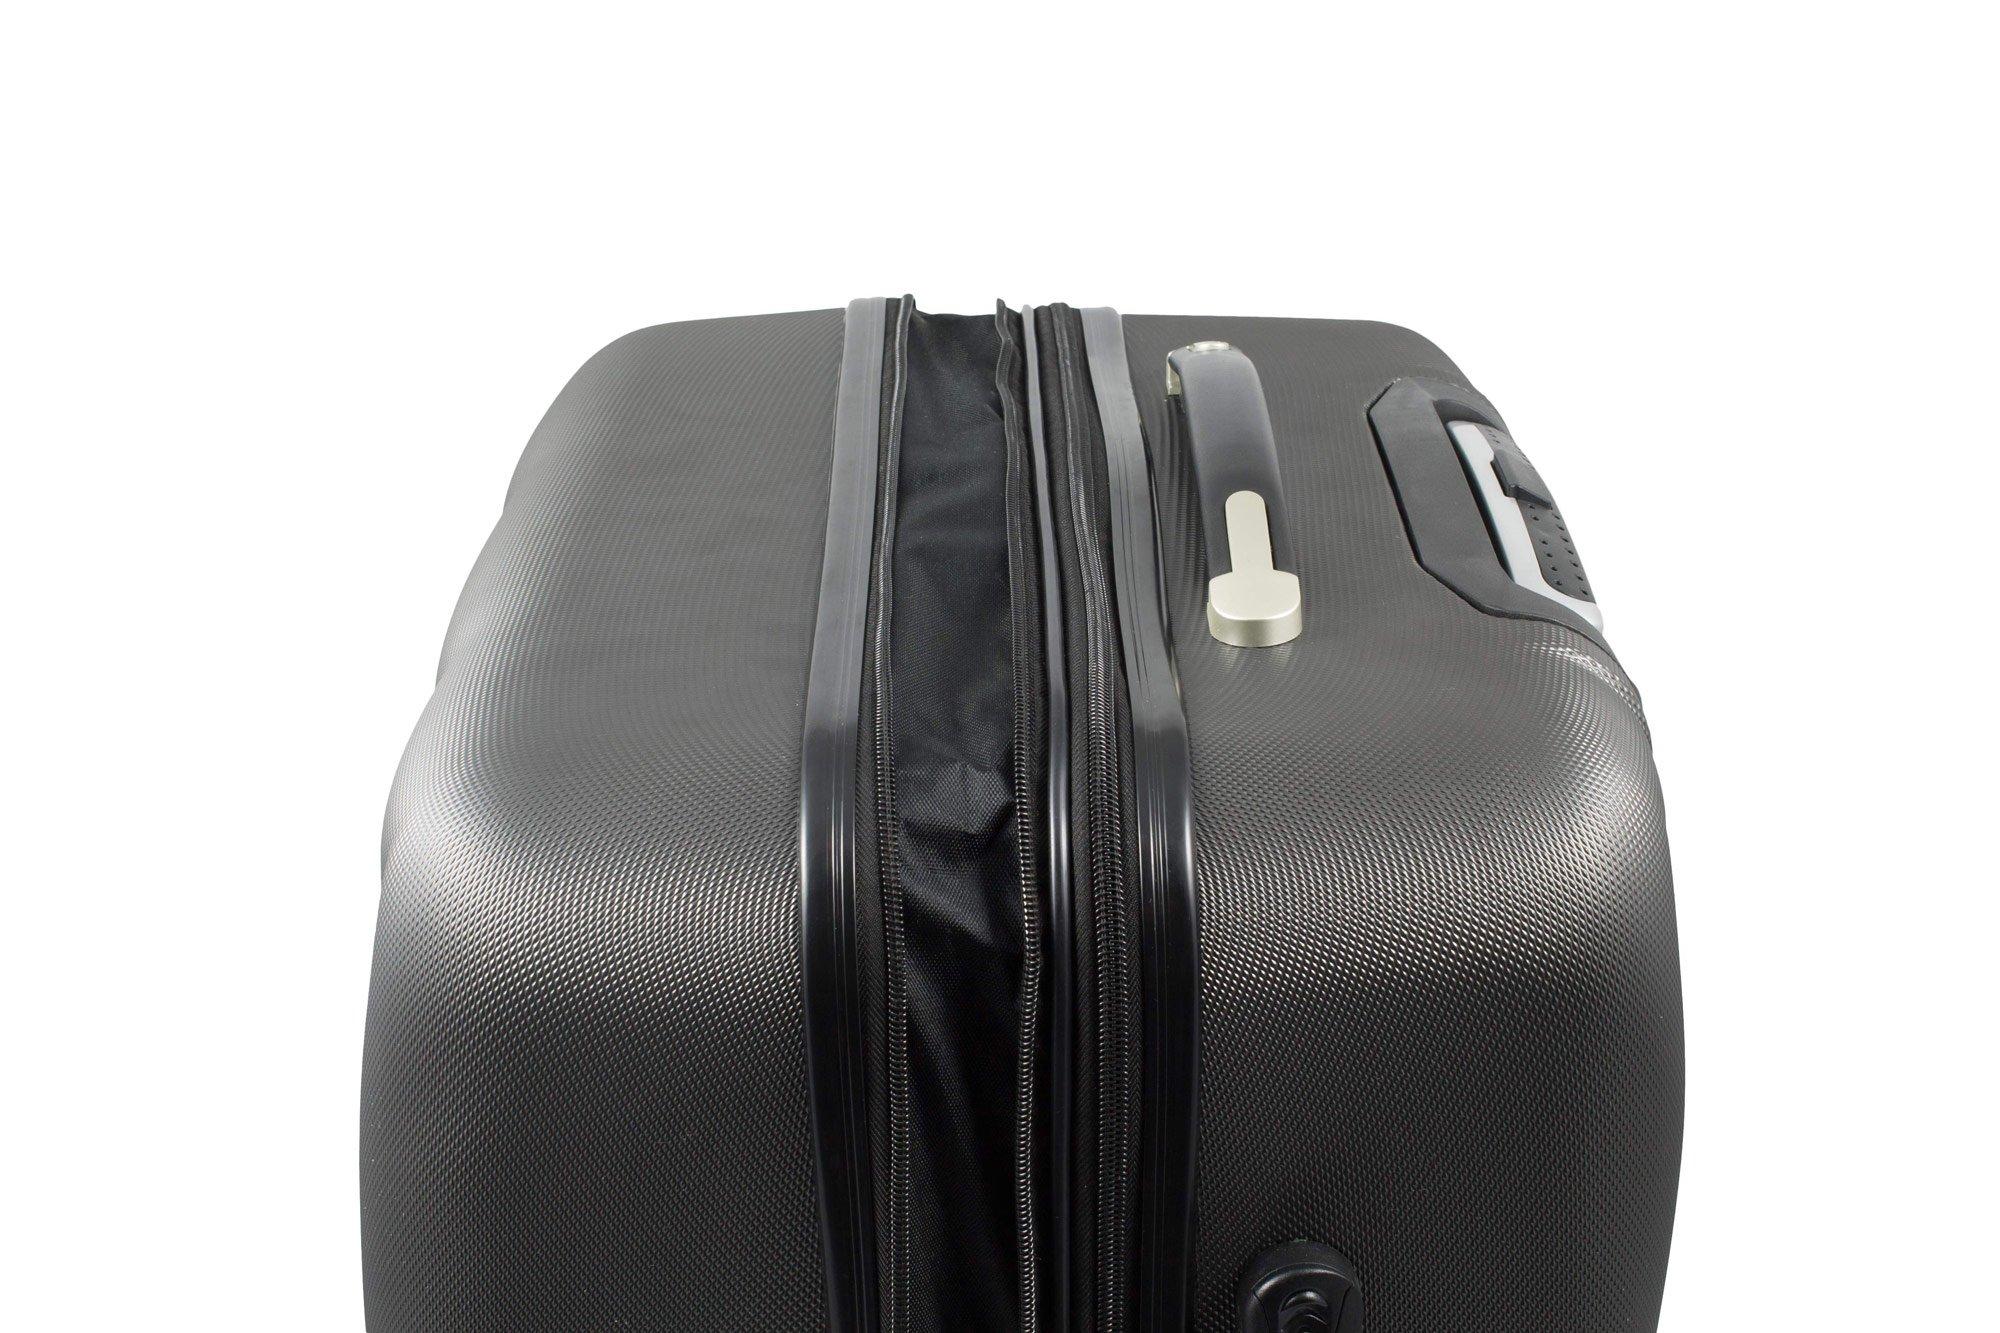 BERWIN-Kofferset-L-XL-2-teilig-Reisekoffer-Trolley-Hartschalenkoffer-ABS-Teleskopgriff-Modell-Squares